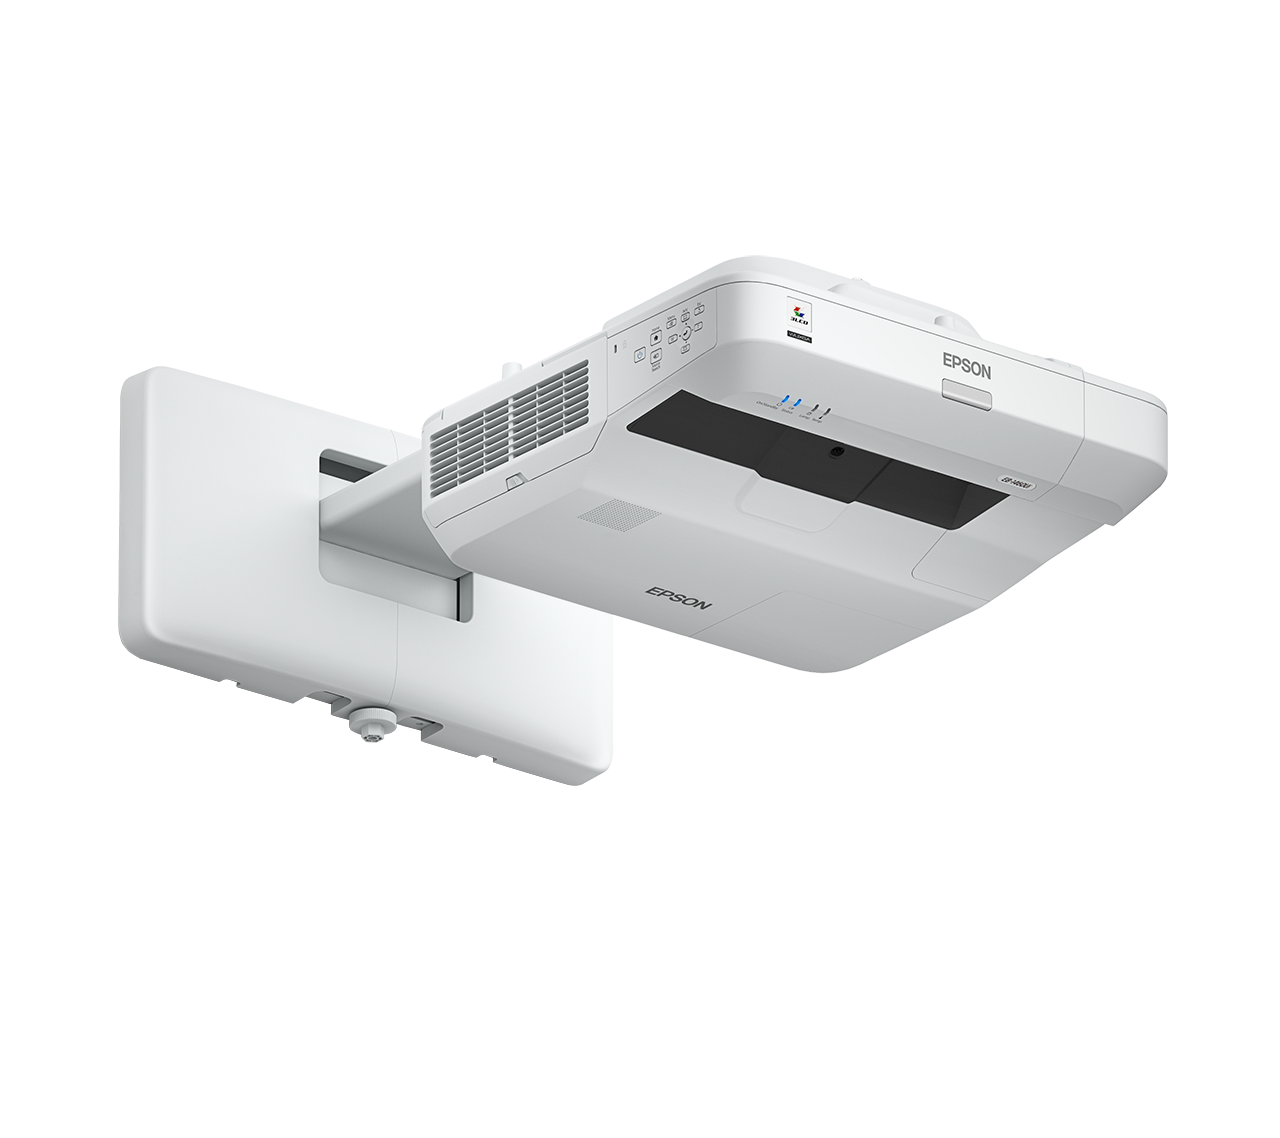 EPSON projektor EB-1440Ui - 1920x1200, 3800ANSI, HDMI, VGA, SHORT, LAN,MHL, interaktivní